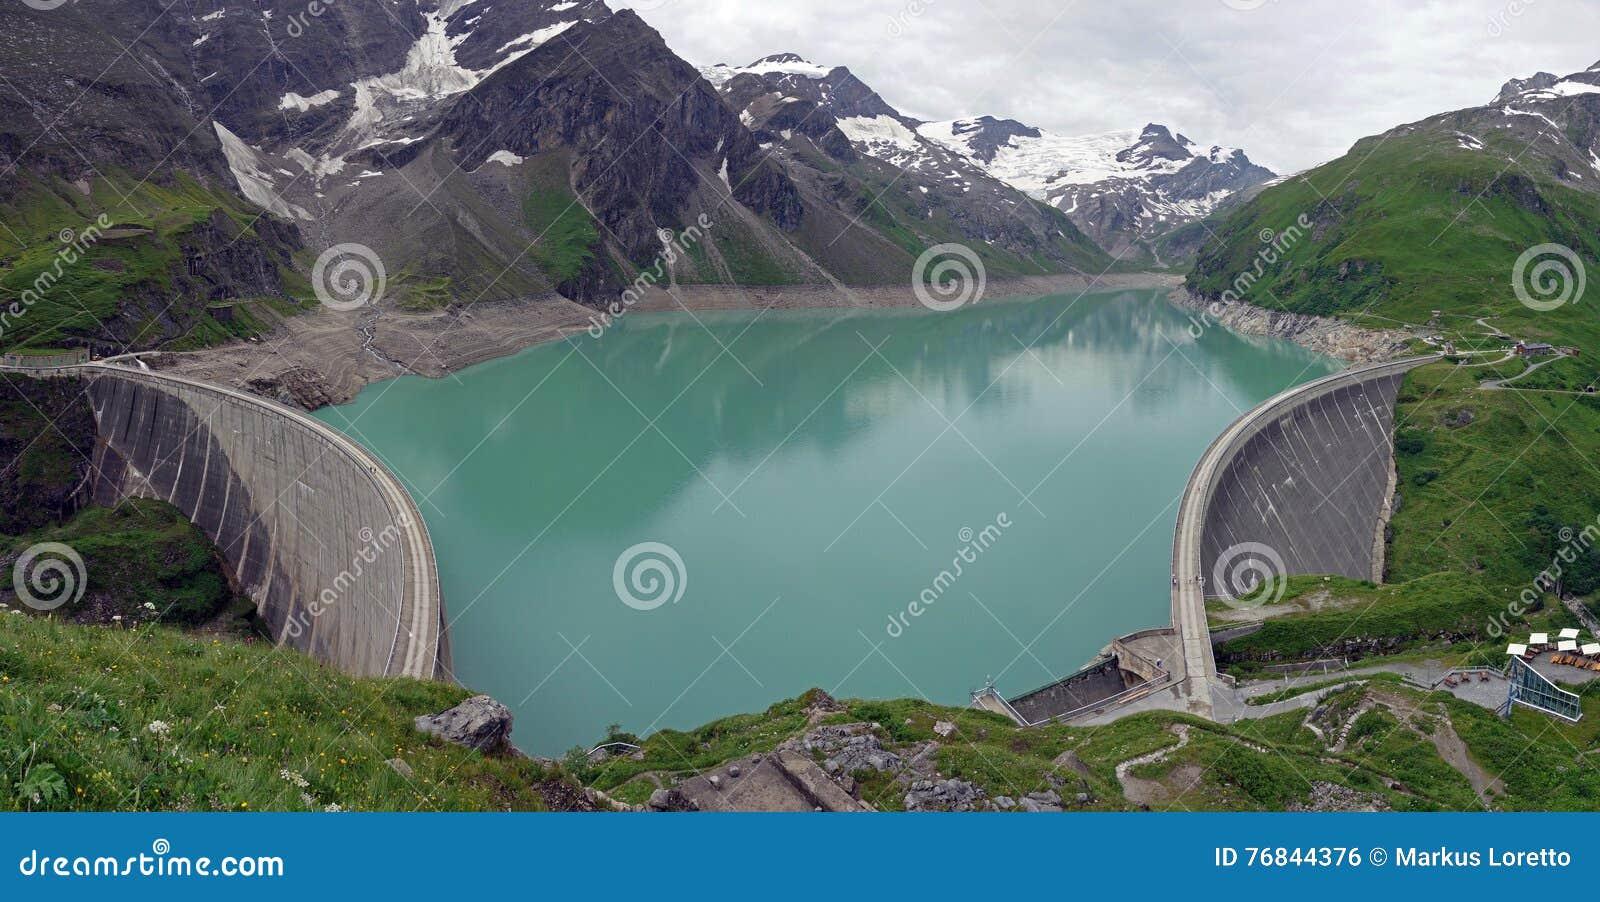 Kaprun水坝, Mooserboden湖